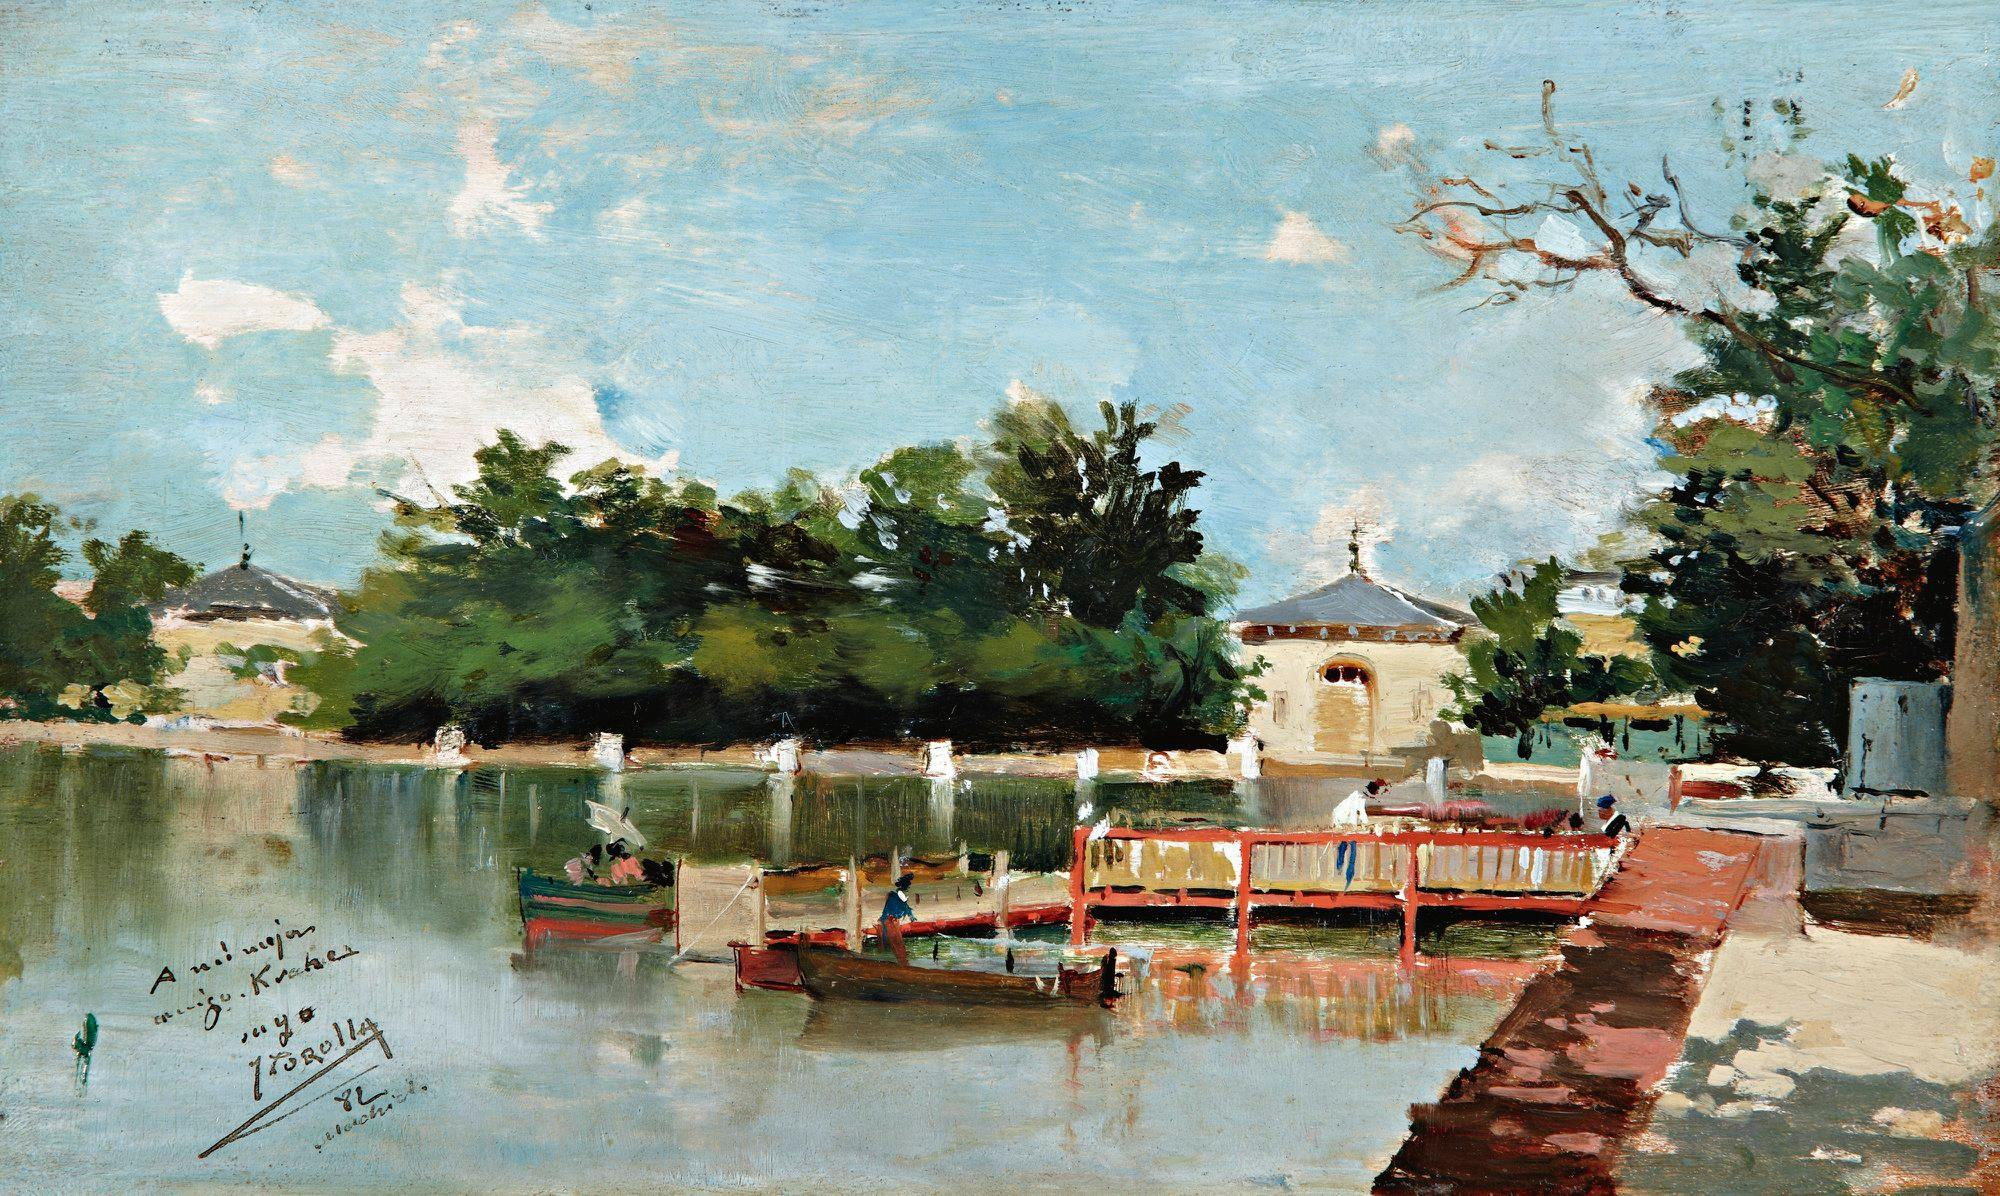 Vista del embarcadero del parque del Retiro 1882 MUSEO SOROLLA